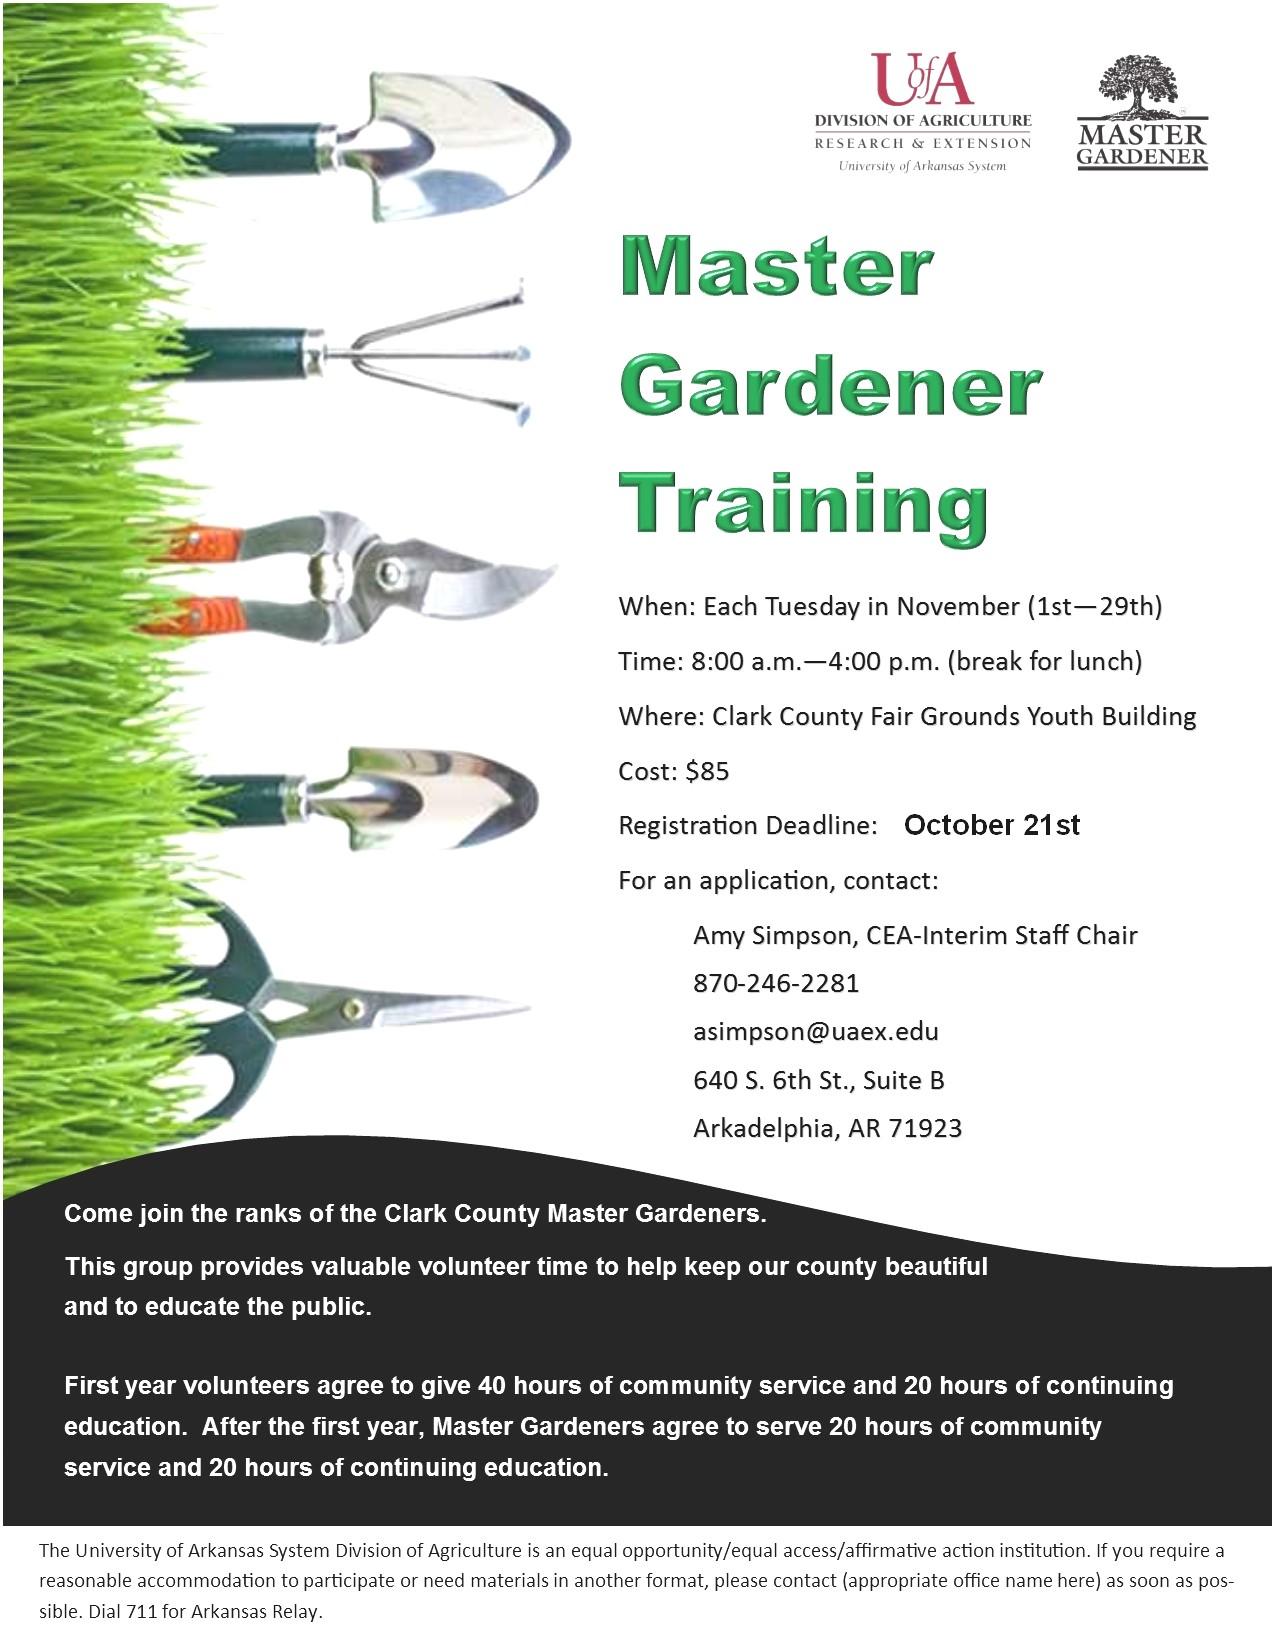 Master Gardener Program Online Master Gardener Program Online Beautiful Clark County Arkansas